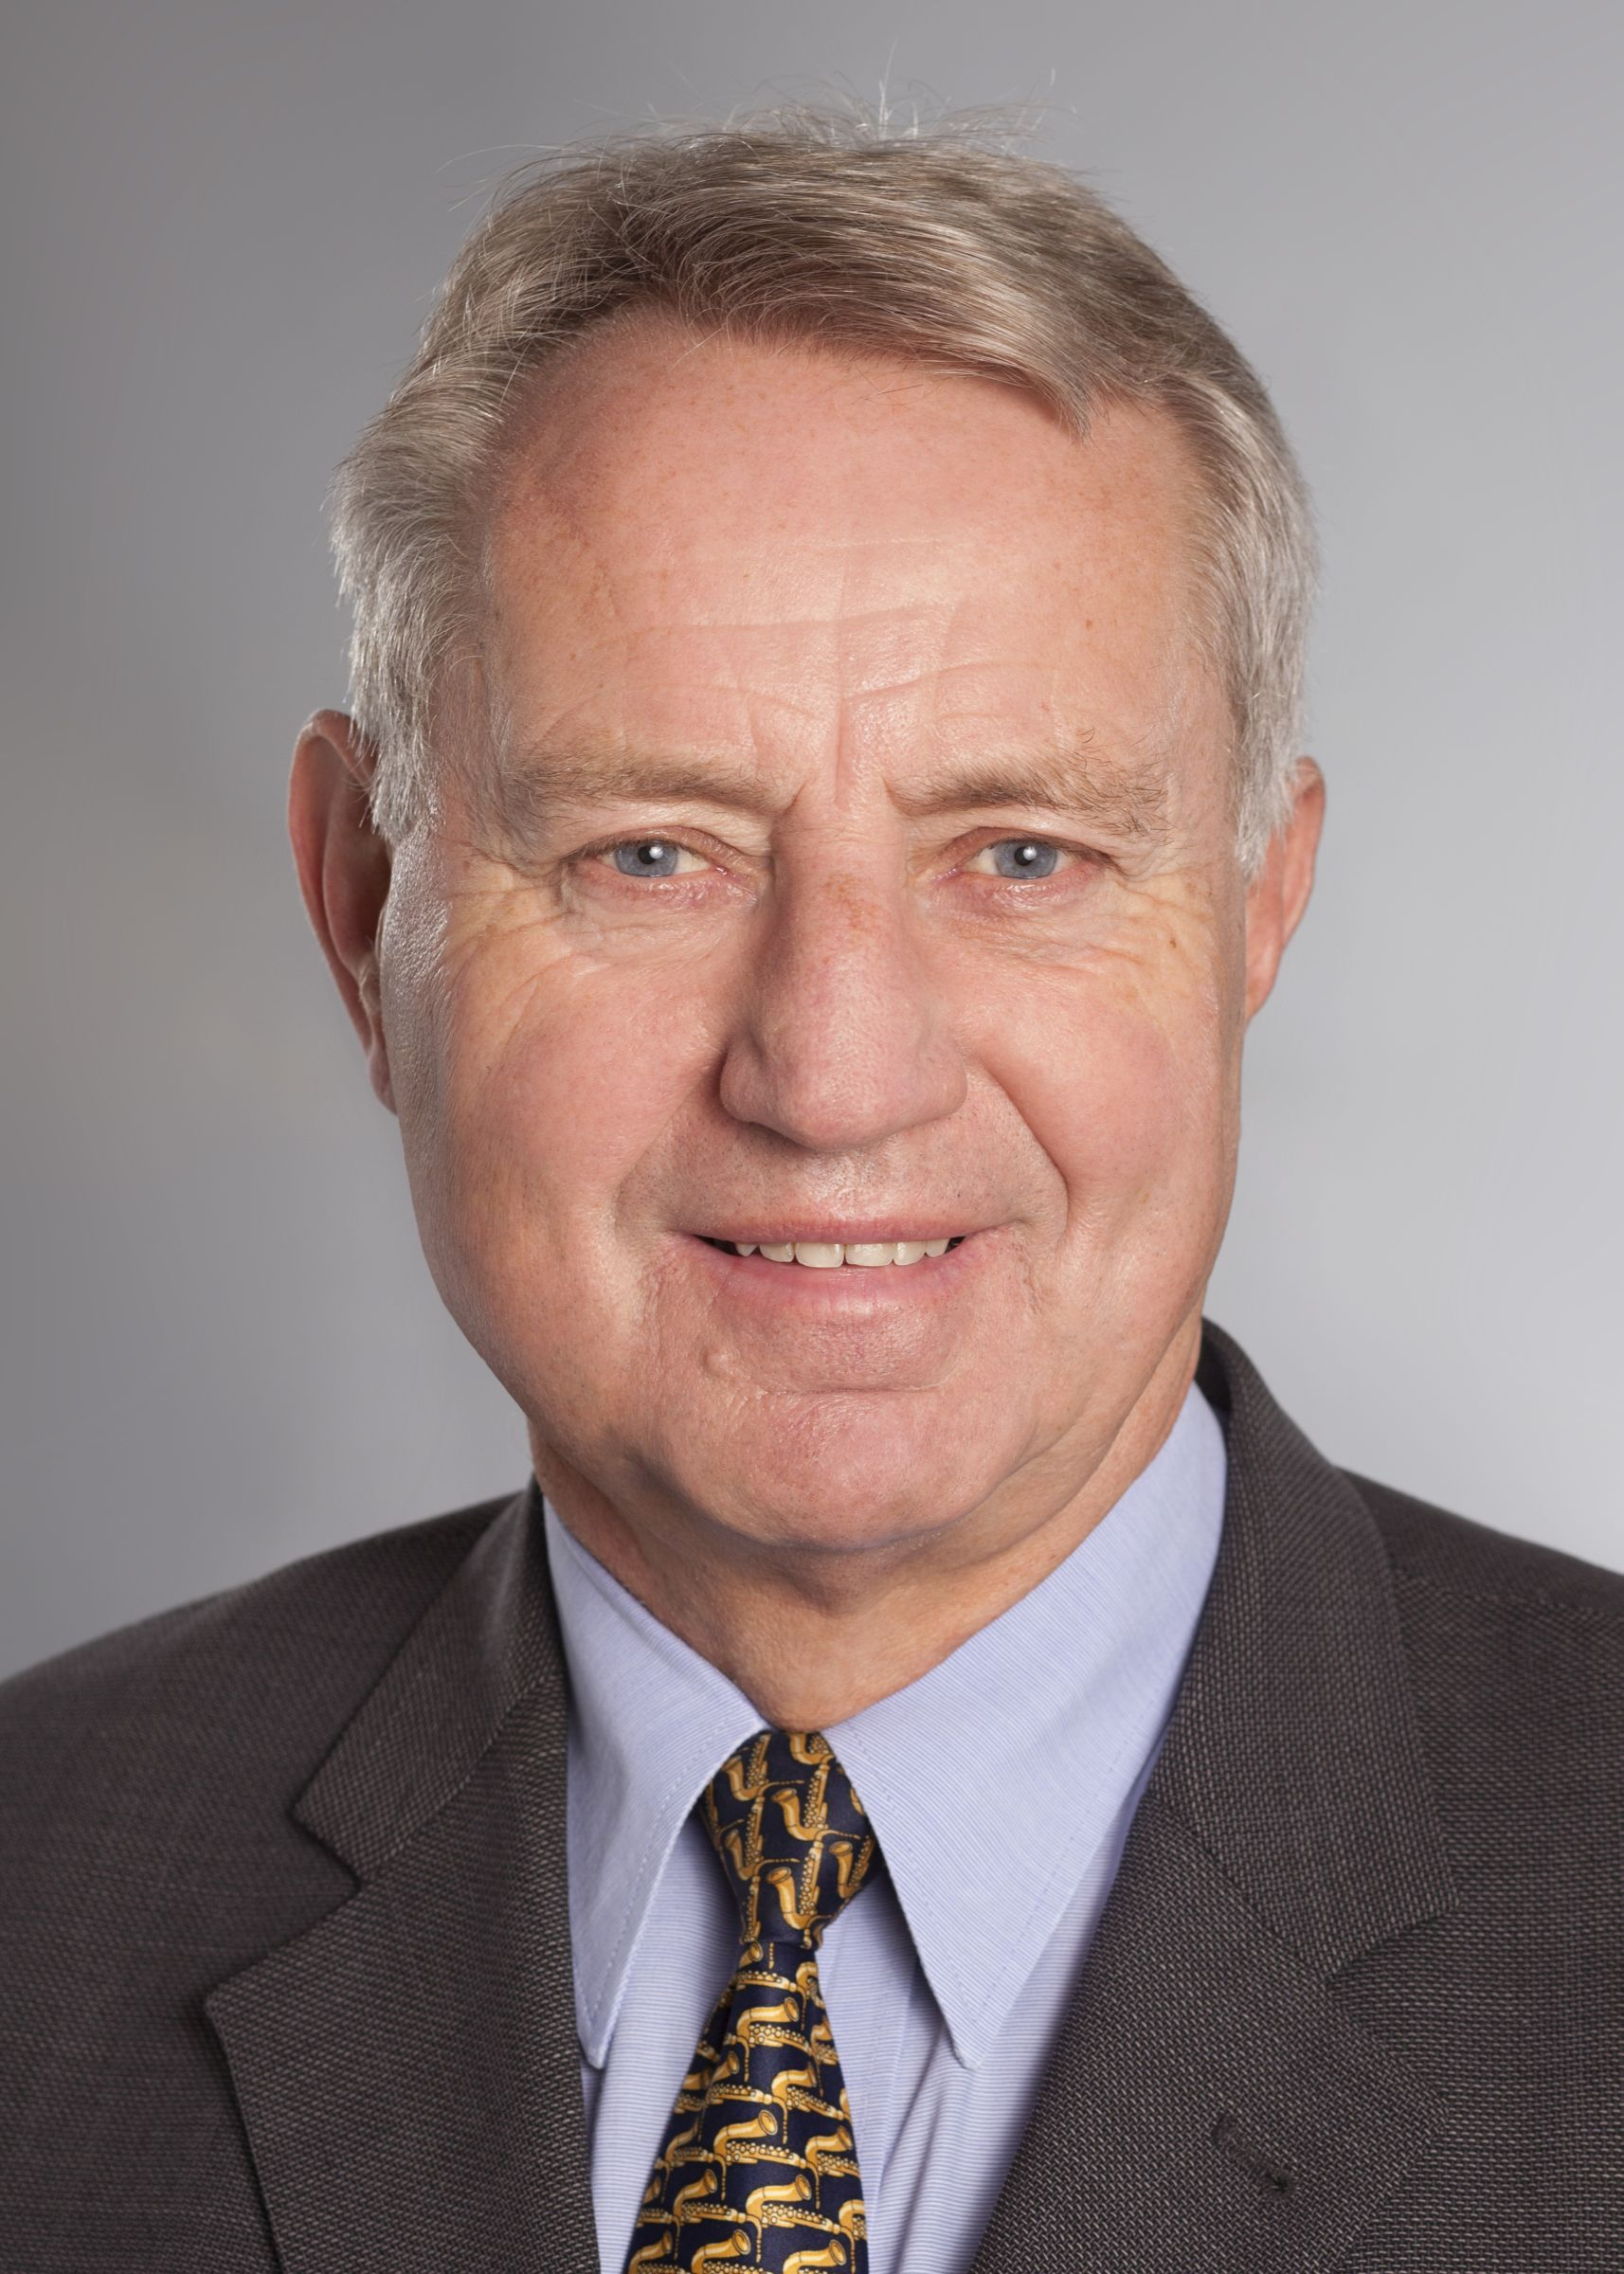 Horst Michael